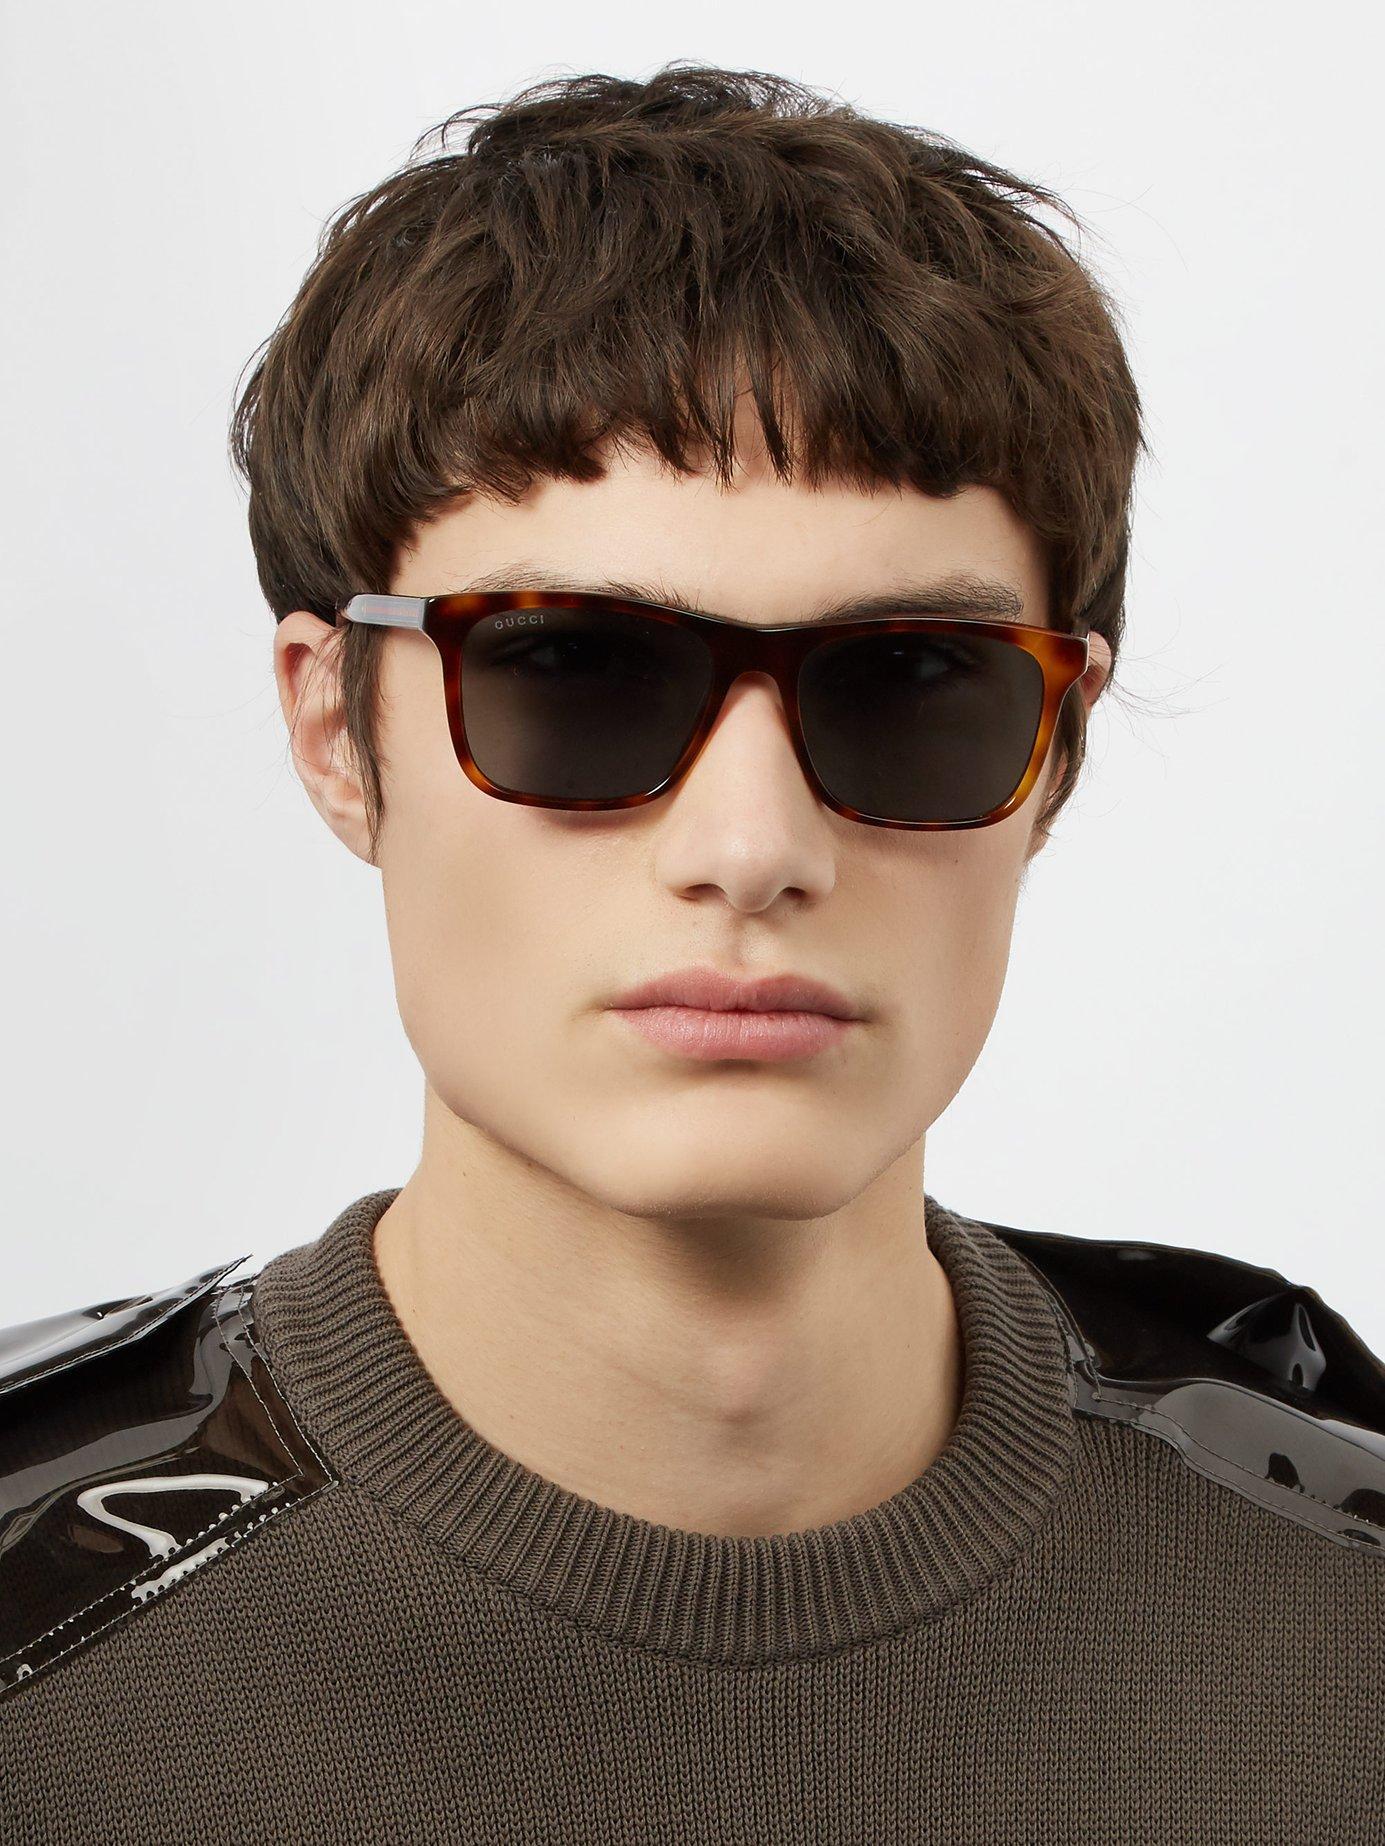 fd1cd9908f12 Gucci Brown Square Acetate Sunglasses for men. View fullscreen